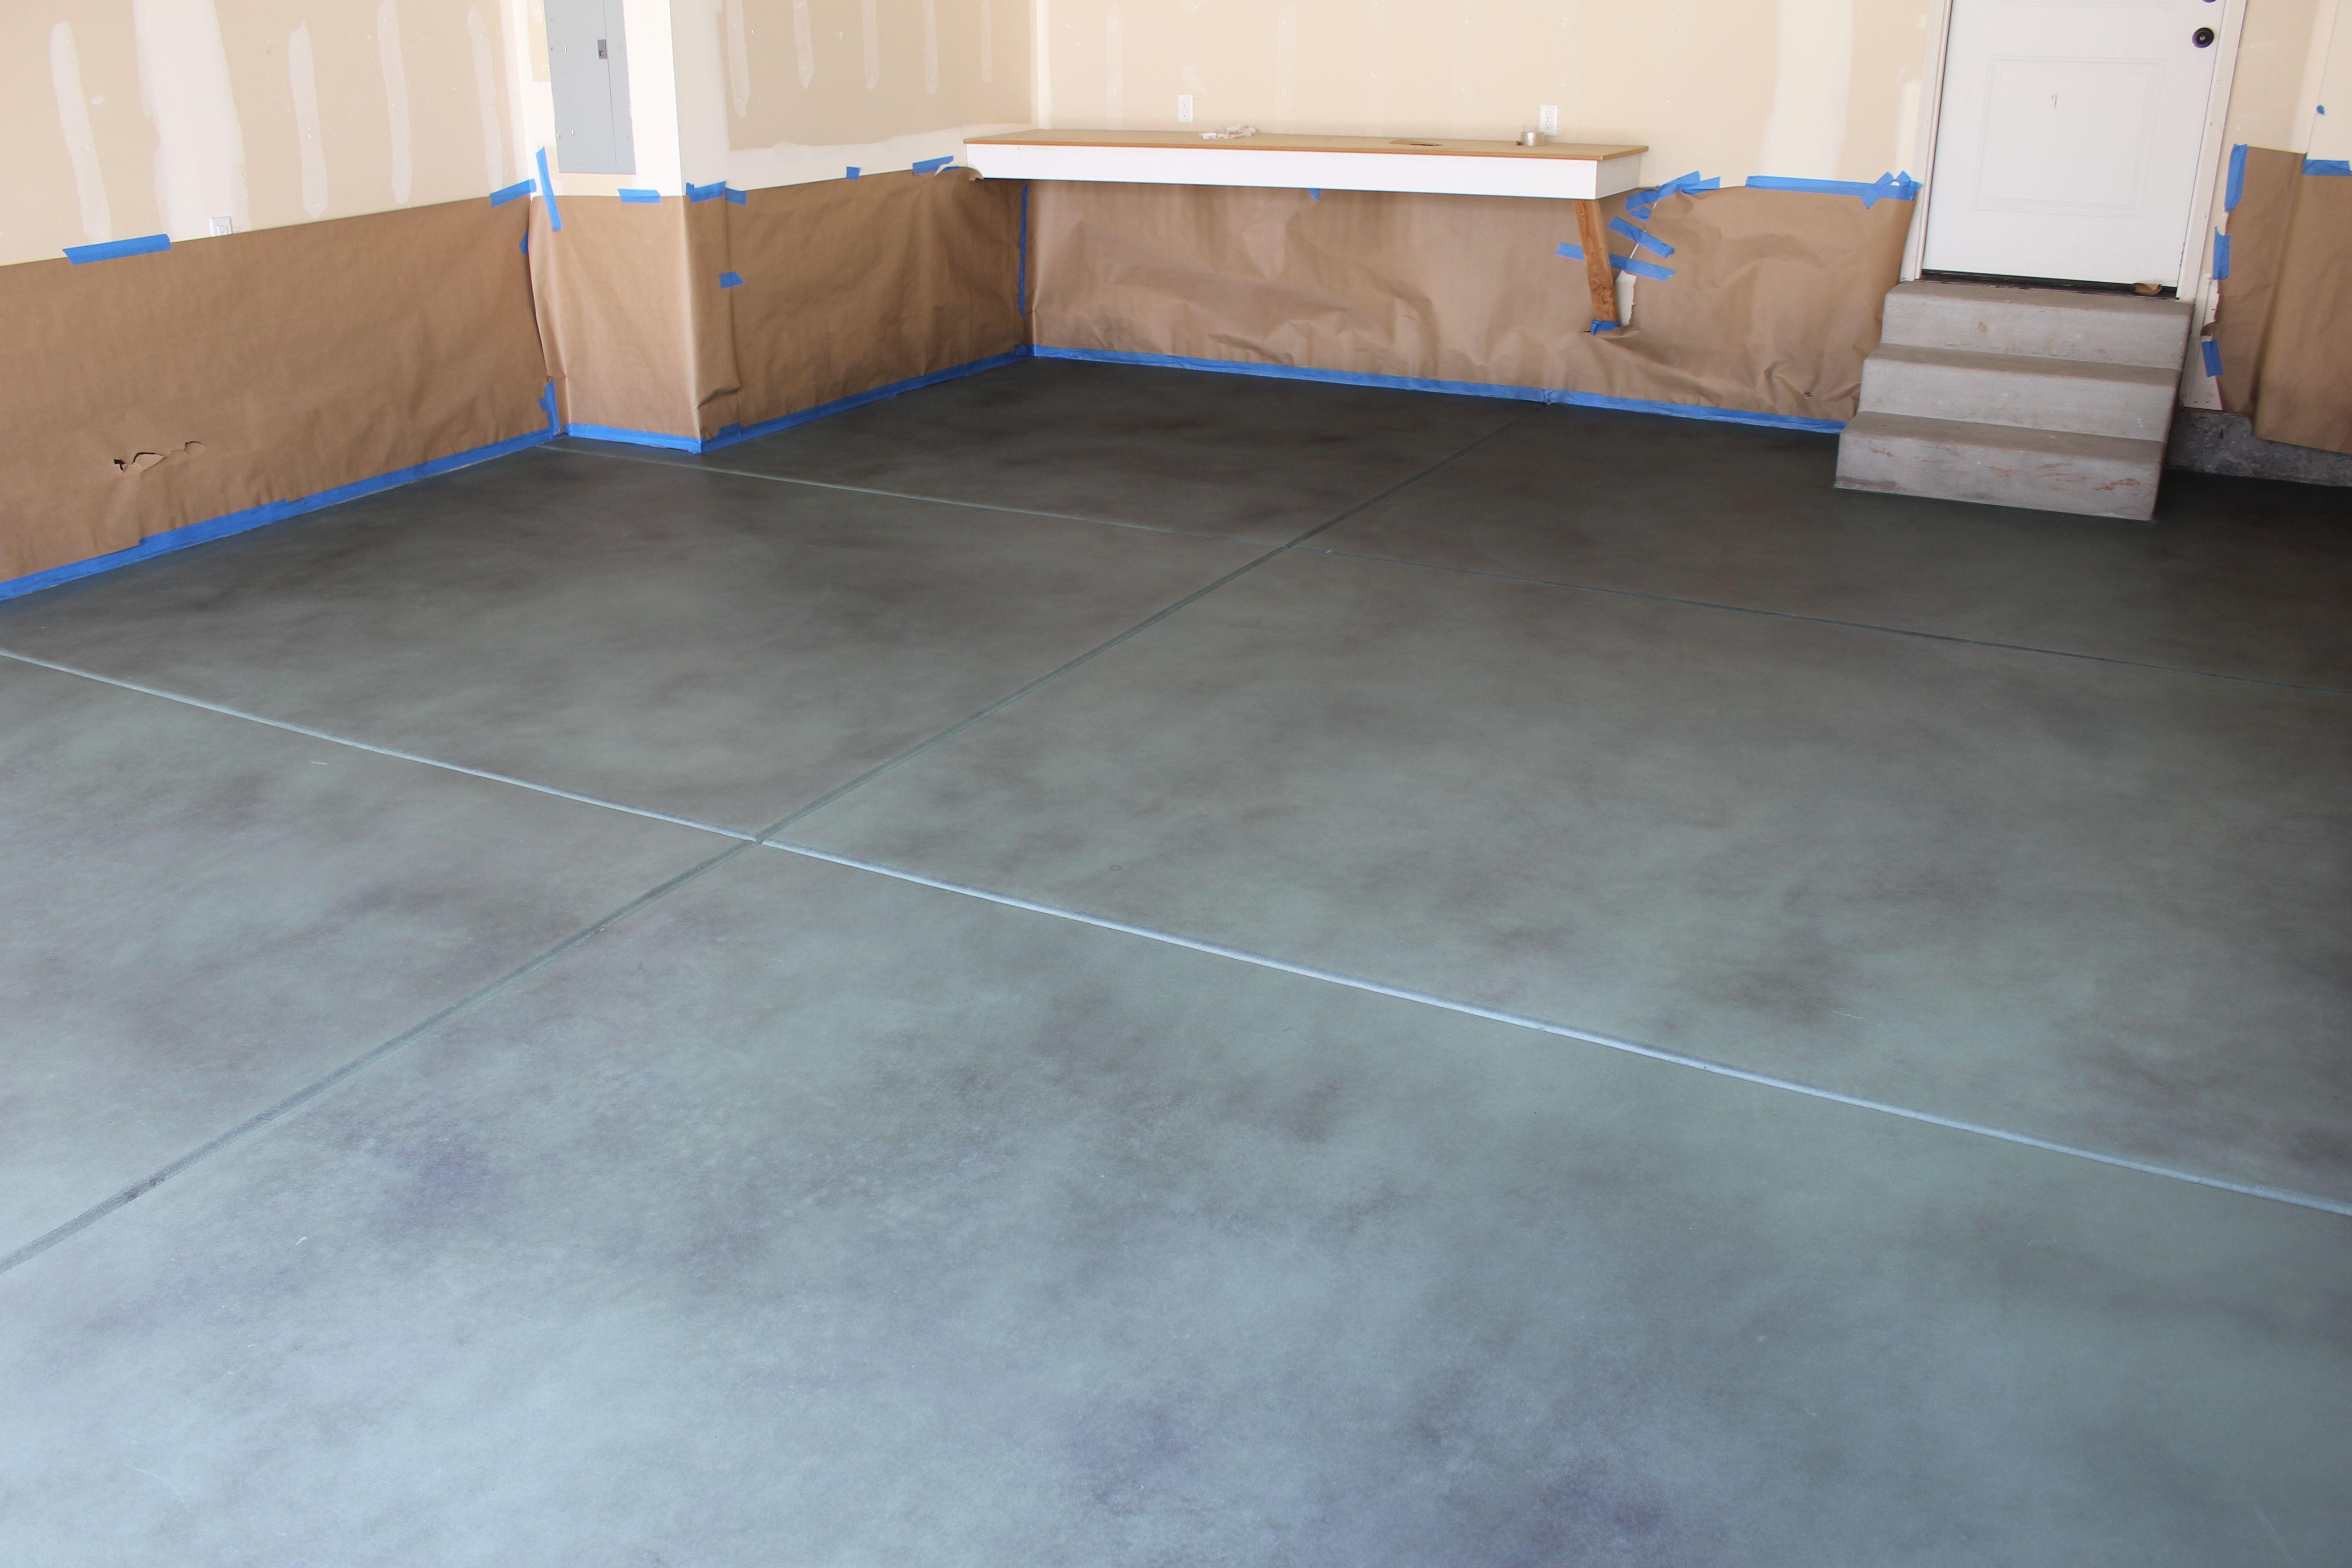 New Concrete Pad for Garage